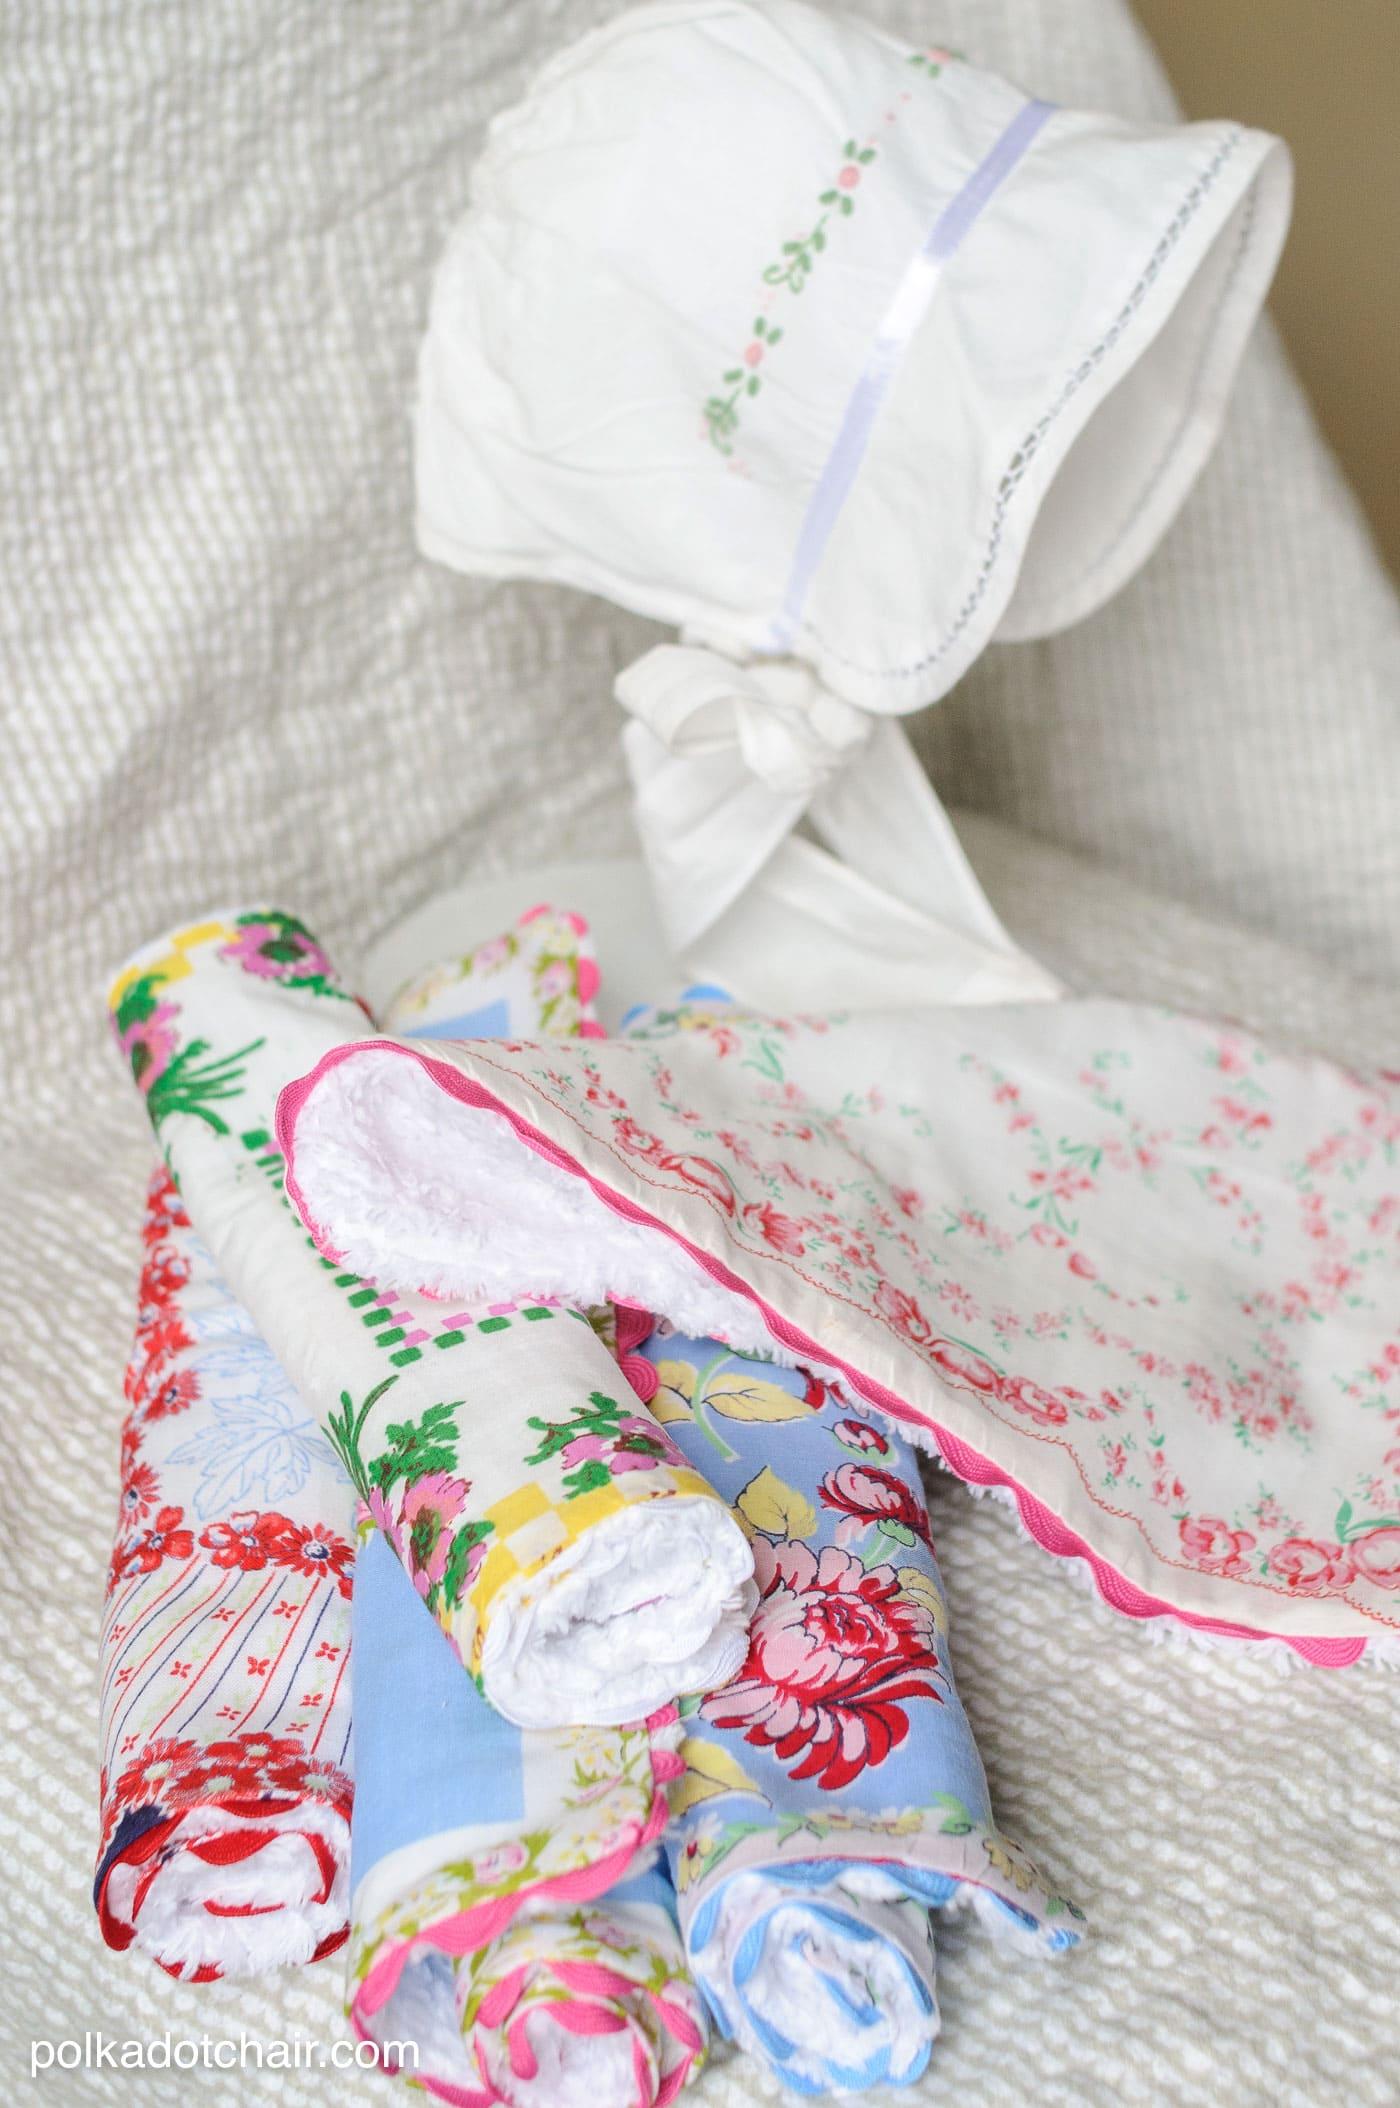 How To Make Baby Burp Cloths